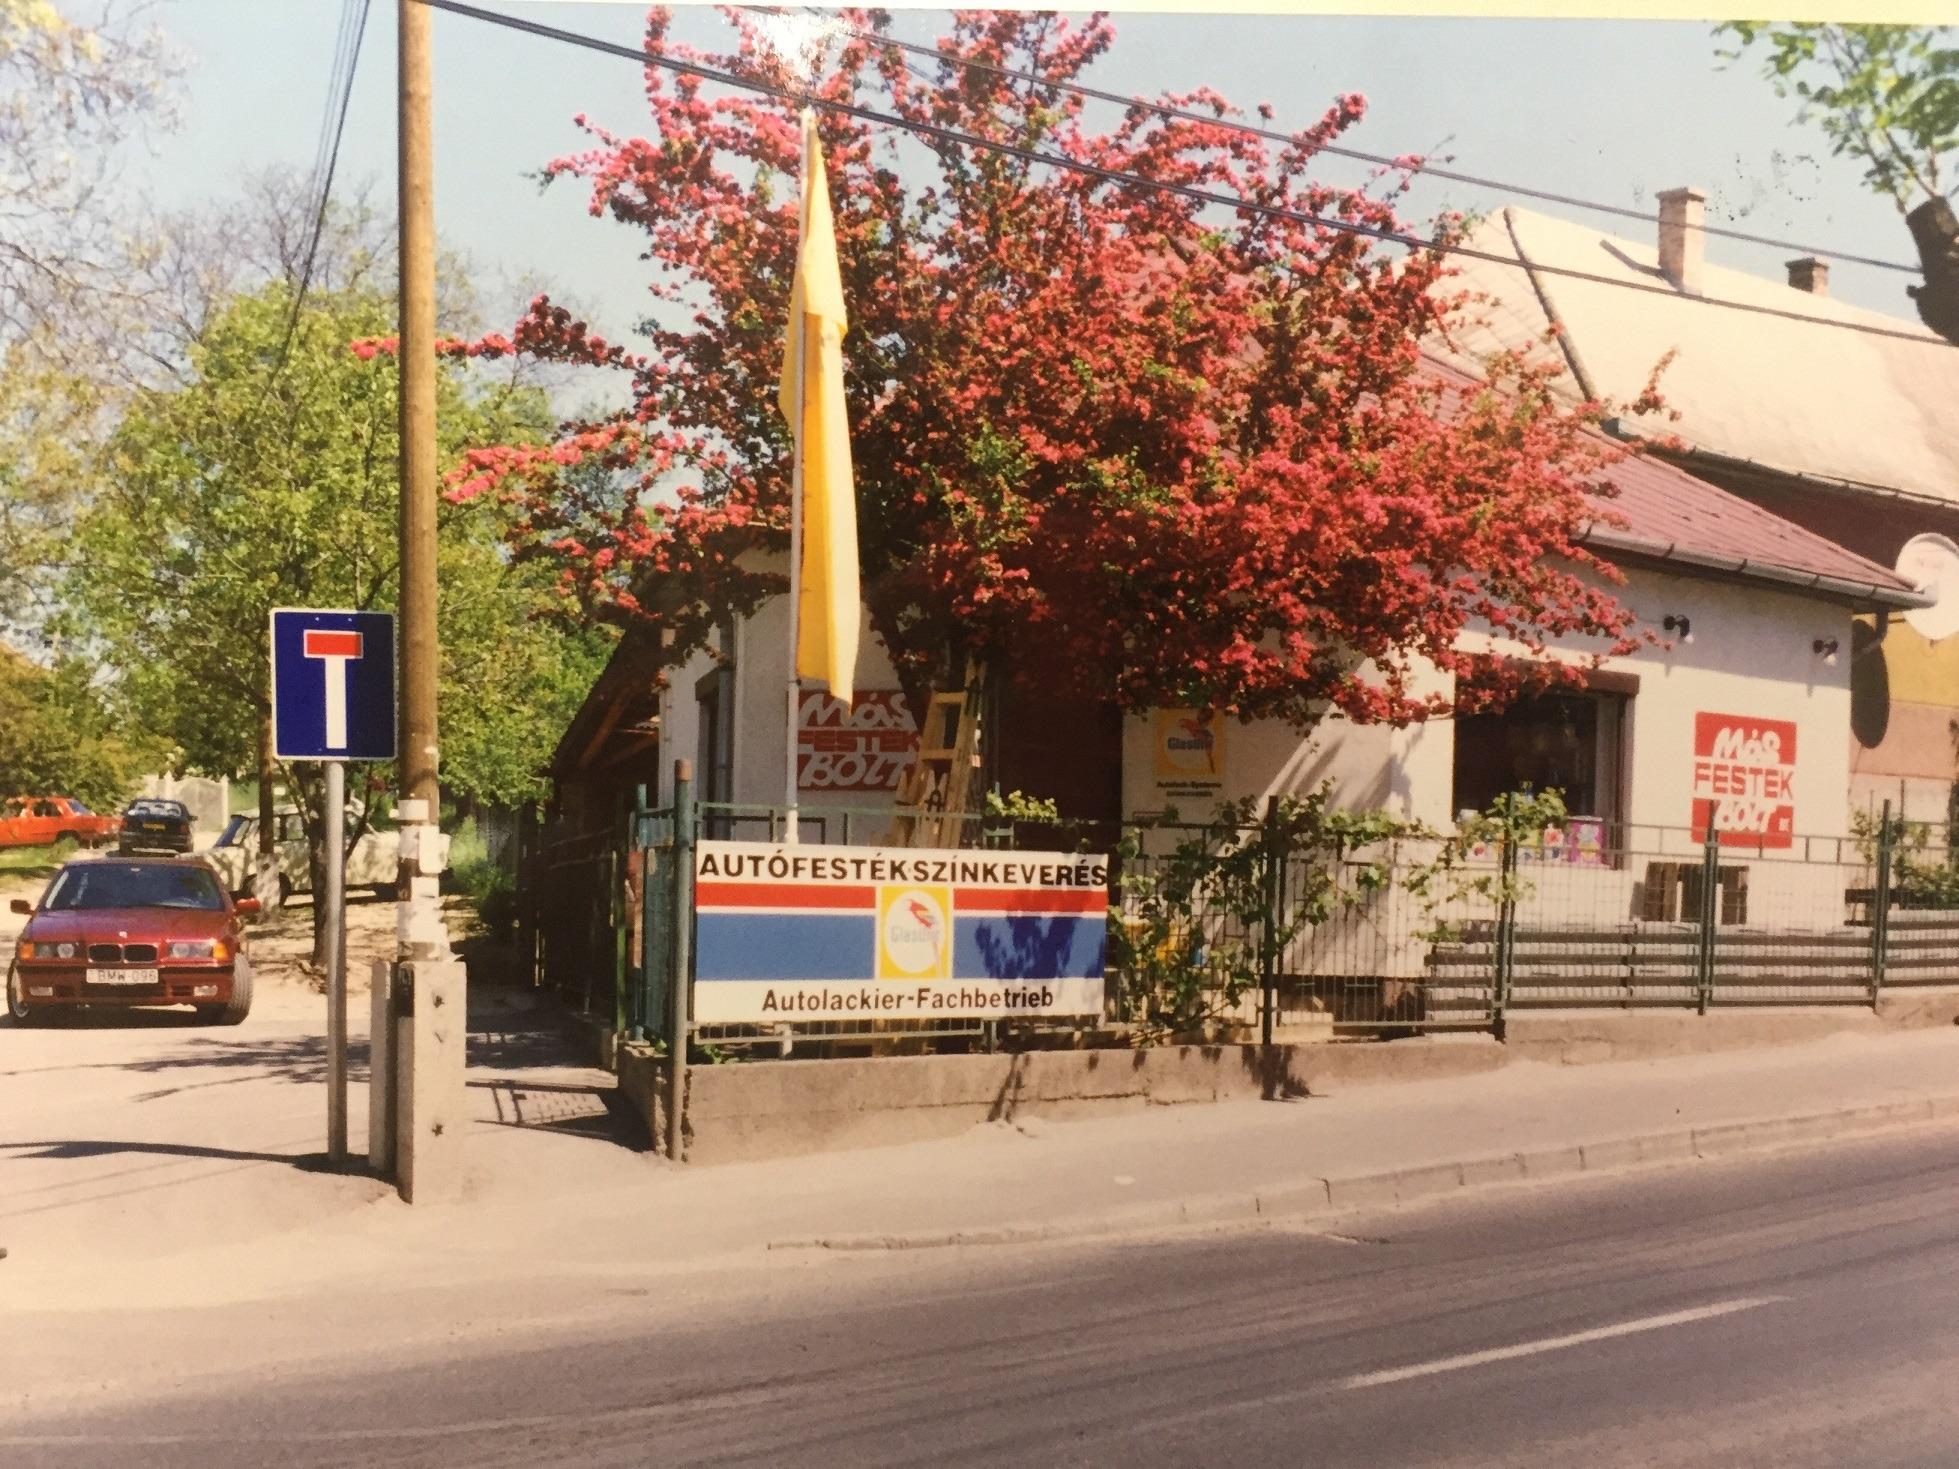 dunakeszi-uzlet-bolt-regen-retro-festekbolt